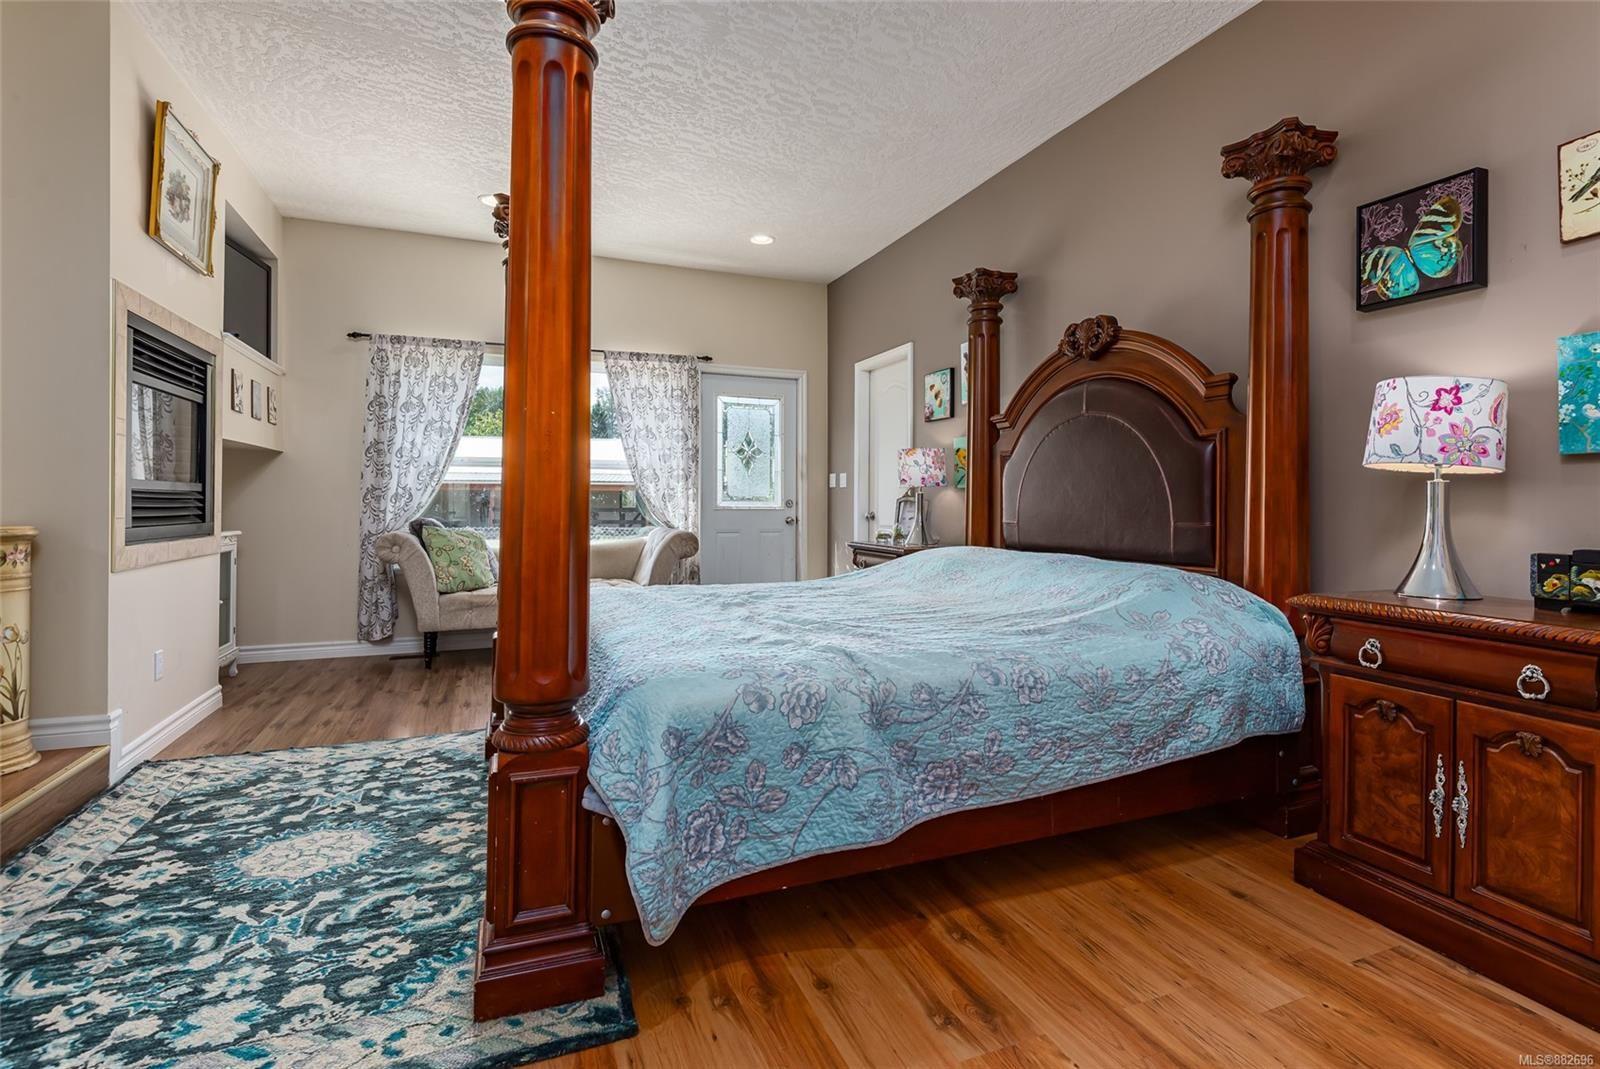 Photo 15: Photos: 3554 MacAulay Rd in : CV Merville Black Creek House for sale (Comox Valley)  : MLS®# 882696